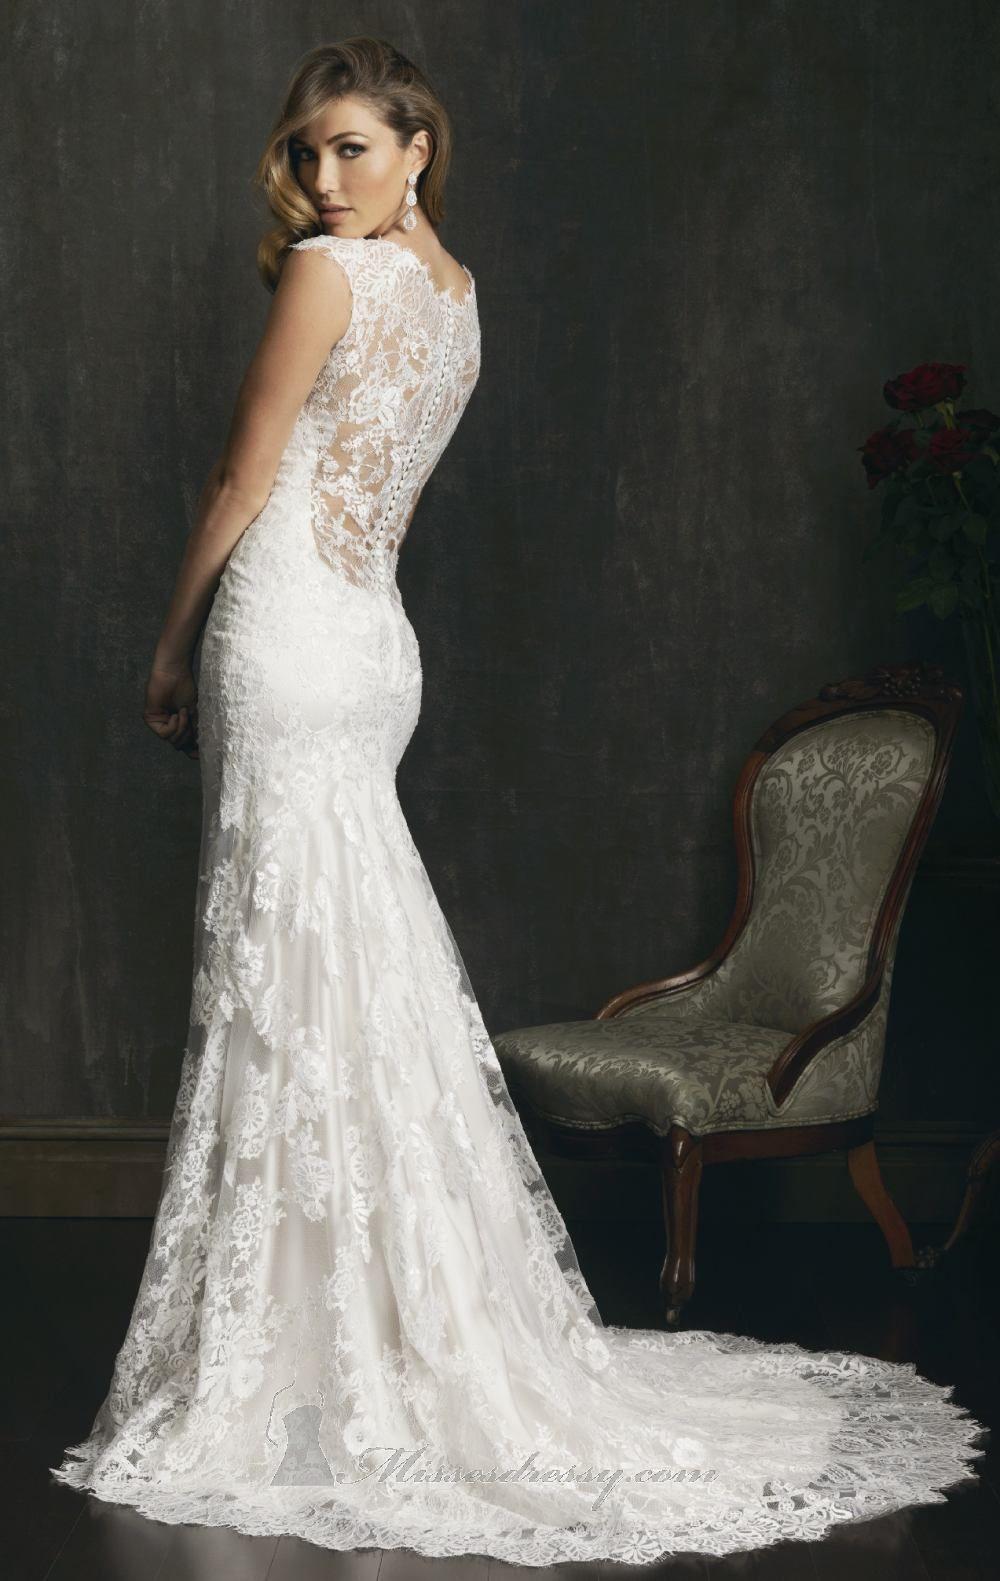 Allure 9068 Available At Kaira S Bridal In Phoenix Az 602 749 1207 Www Kairasbridal Com Allure Wedding Dresses Lace Bridal Gown Wedding Dresses Lace